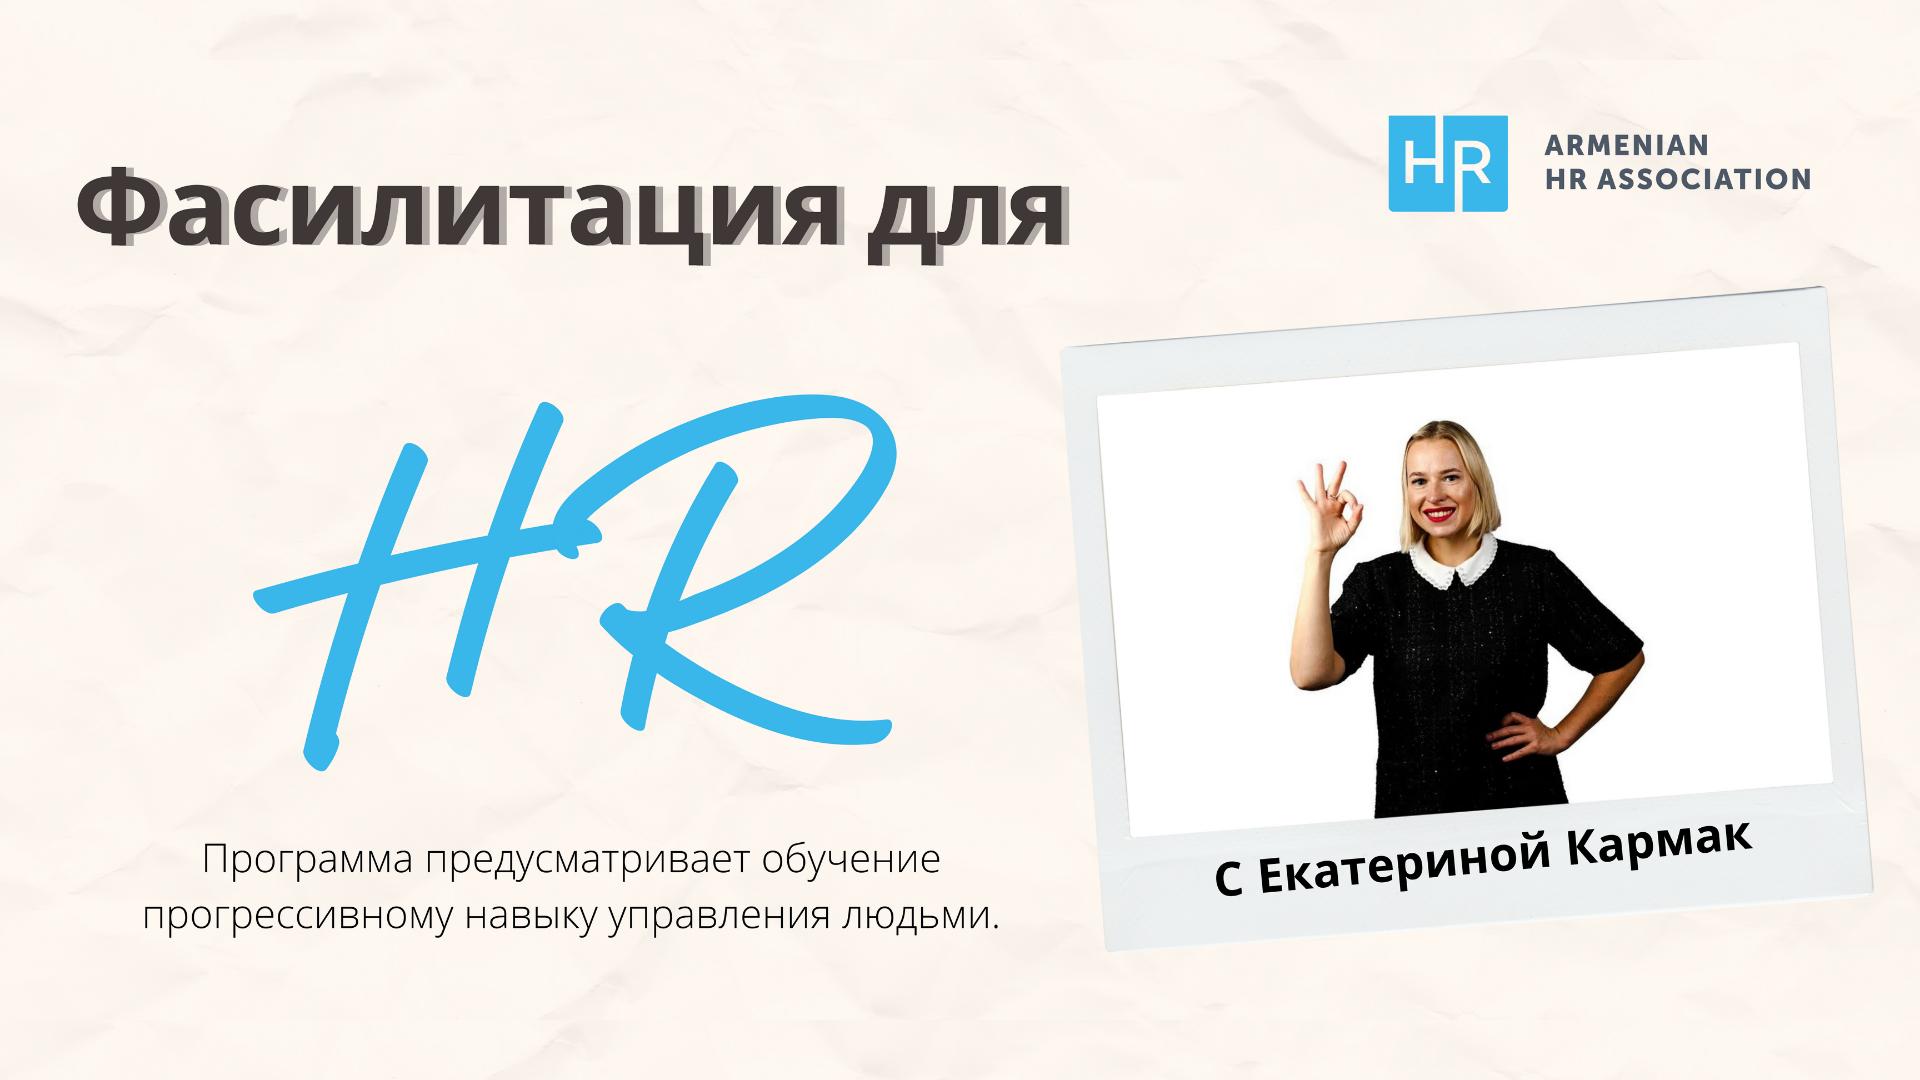 Facilitation for HR